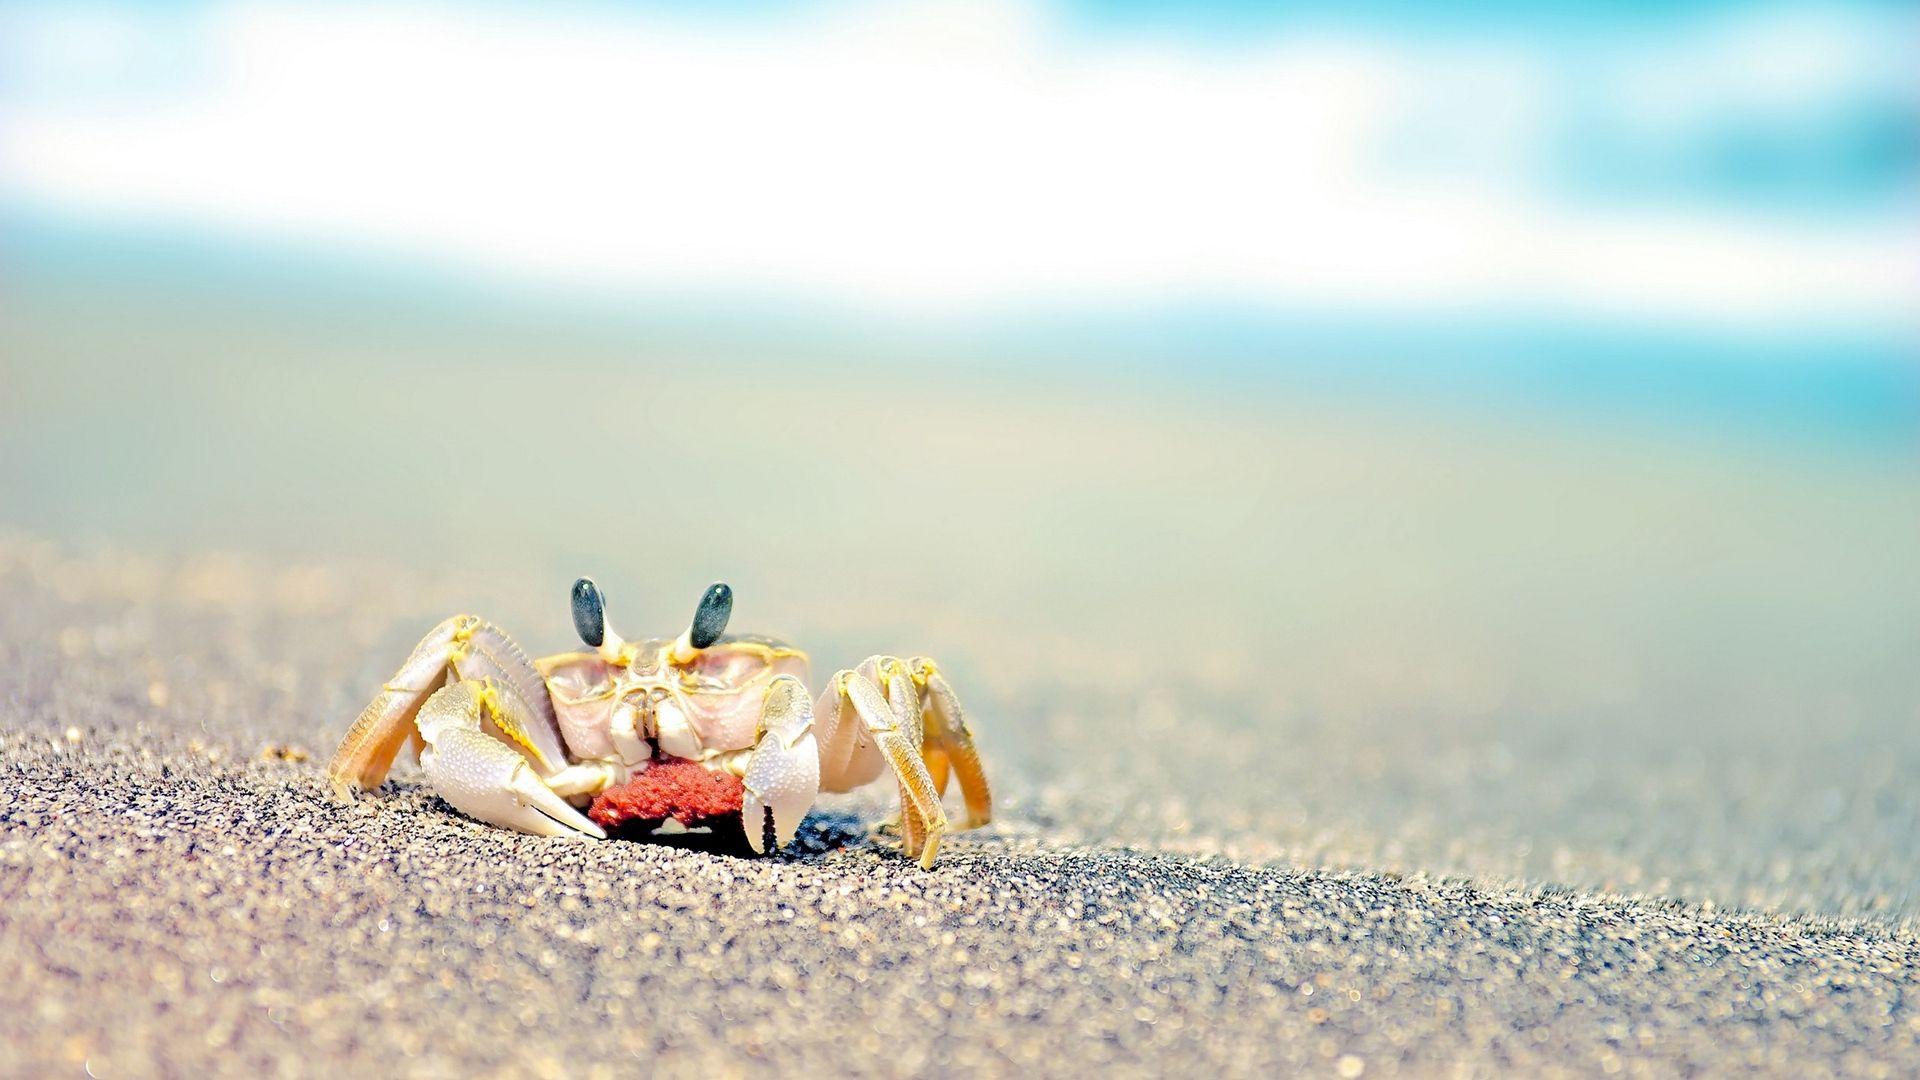 Crab wallpaper photo